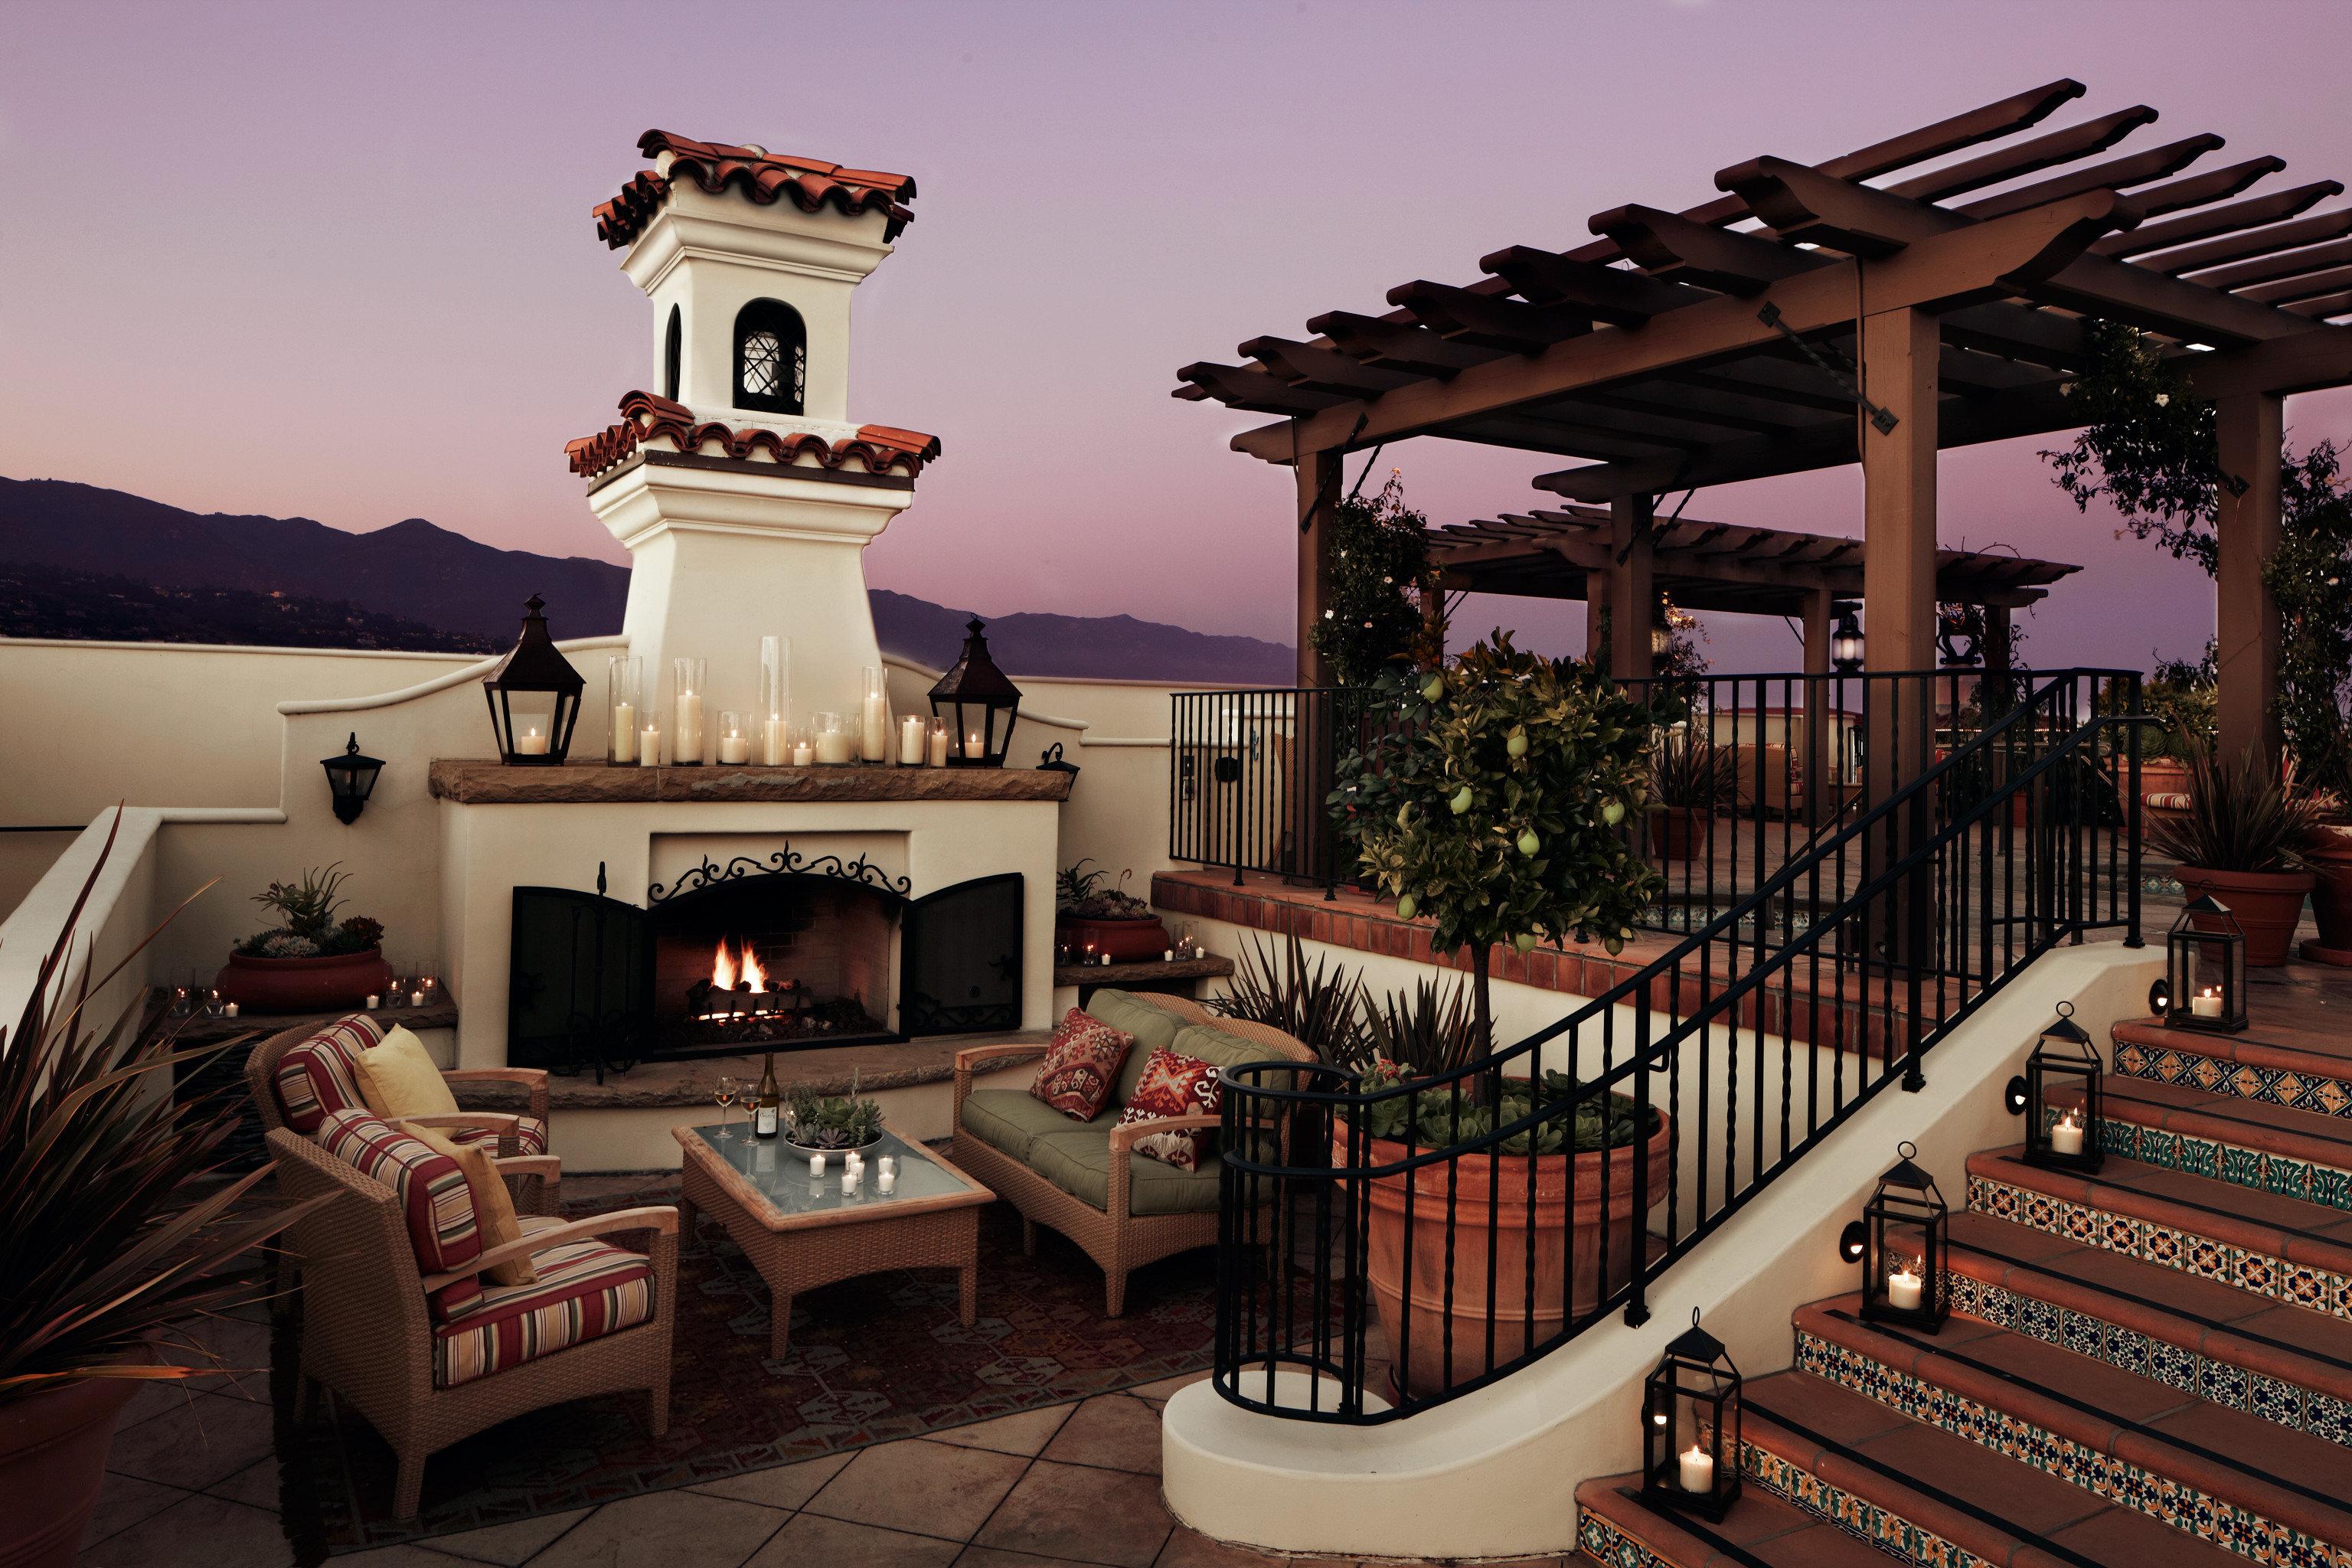 Boutique Elegant Exterior Fireplace Hotels Lounge Sunset Trip Ideas sky house mansion home Resort